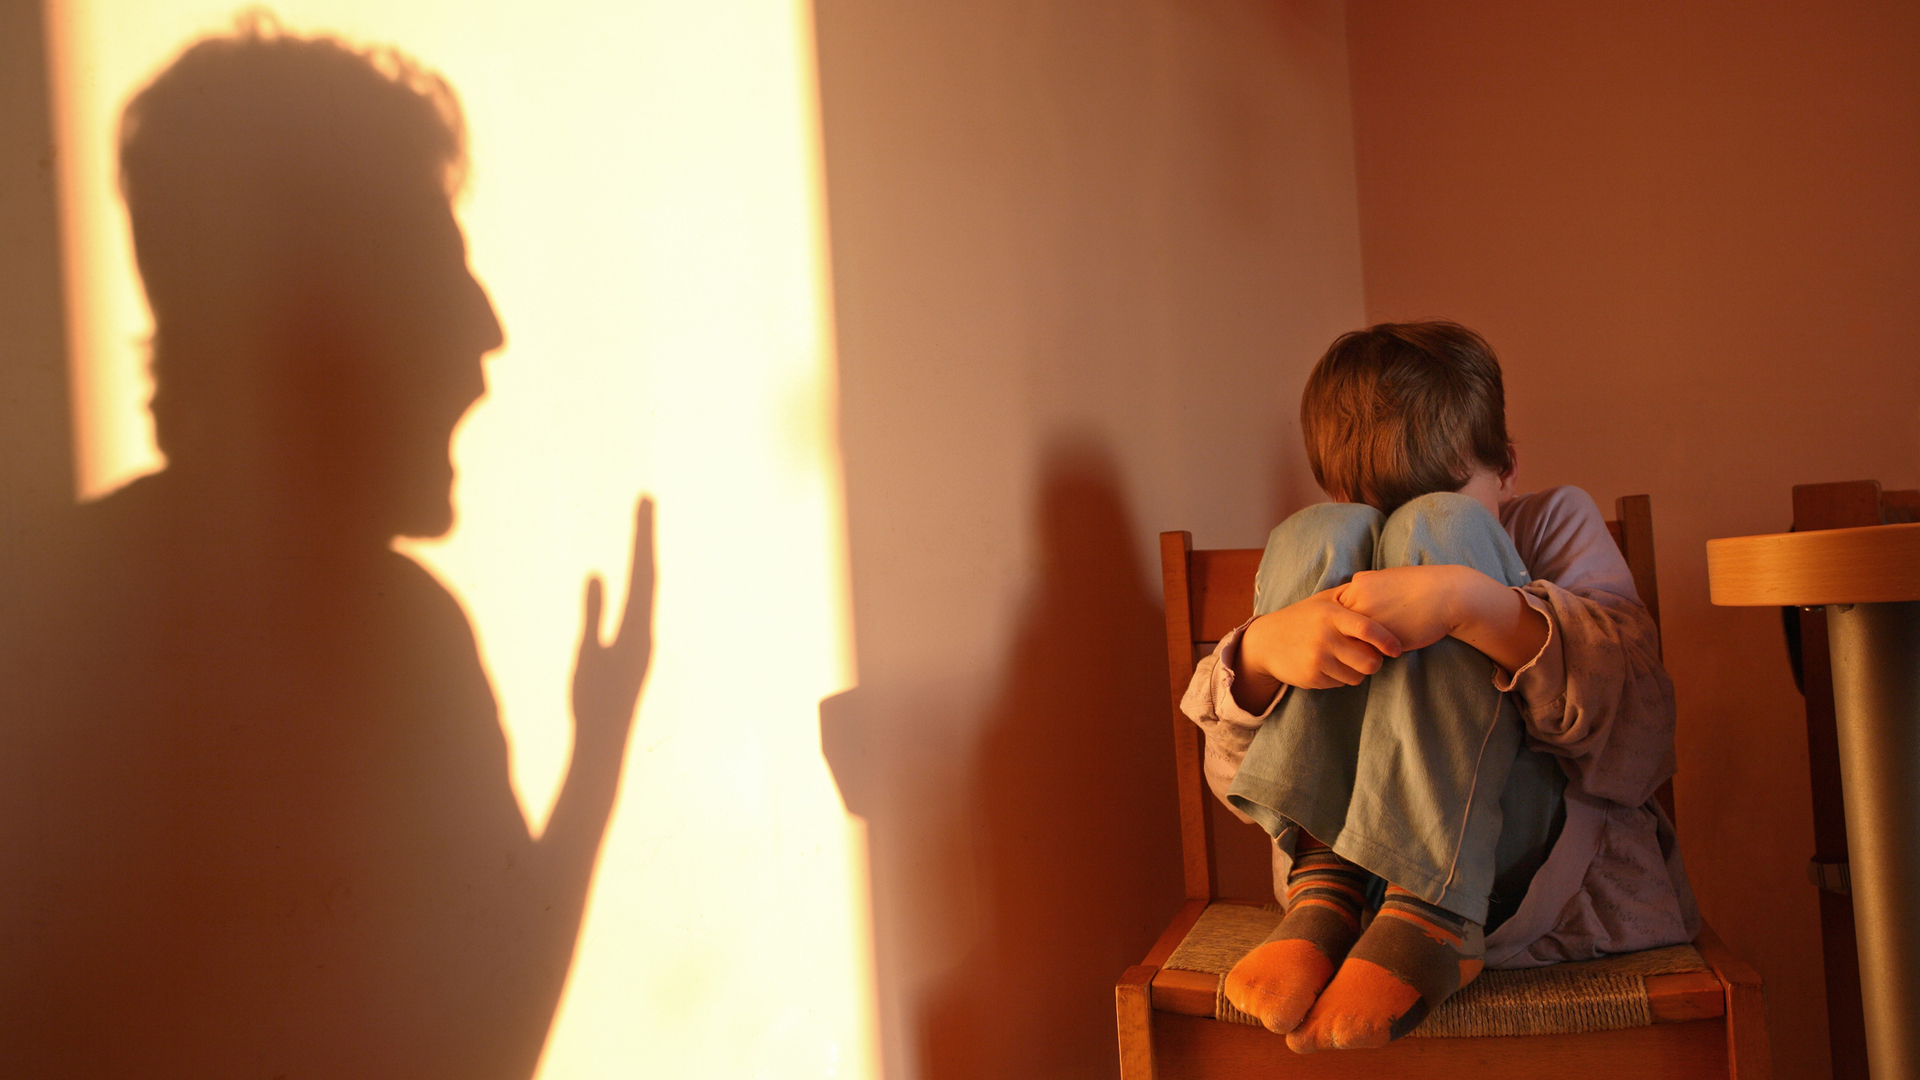 La Epidemiología del maltrato infantil